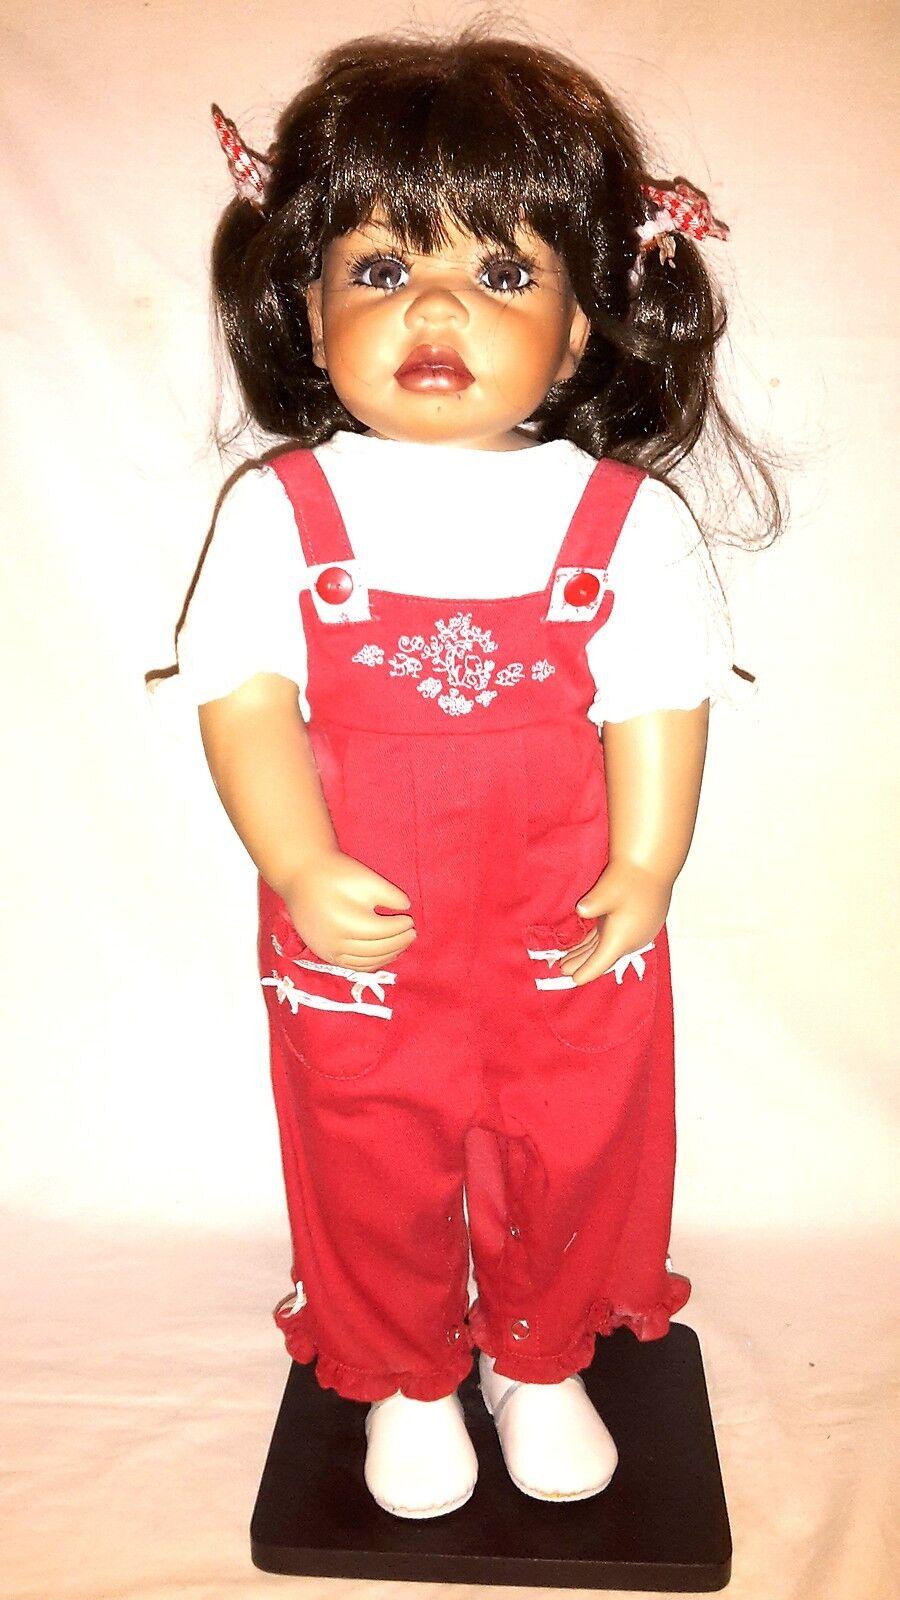 Artista Bambola Mary da Pauline van Wees PORCELLANA circa 60cm stata limitata n. 10 500